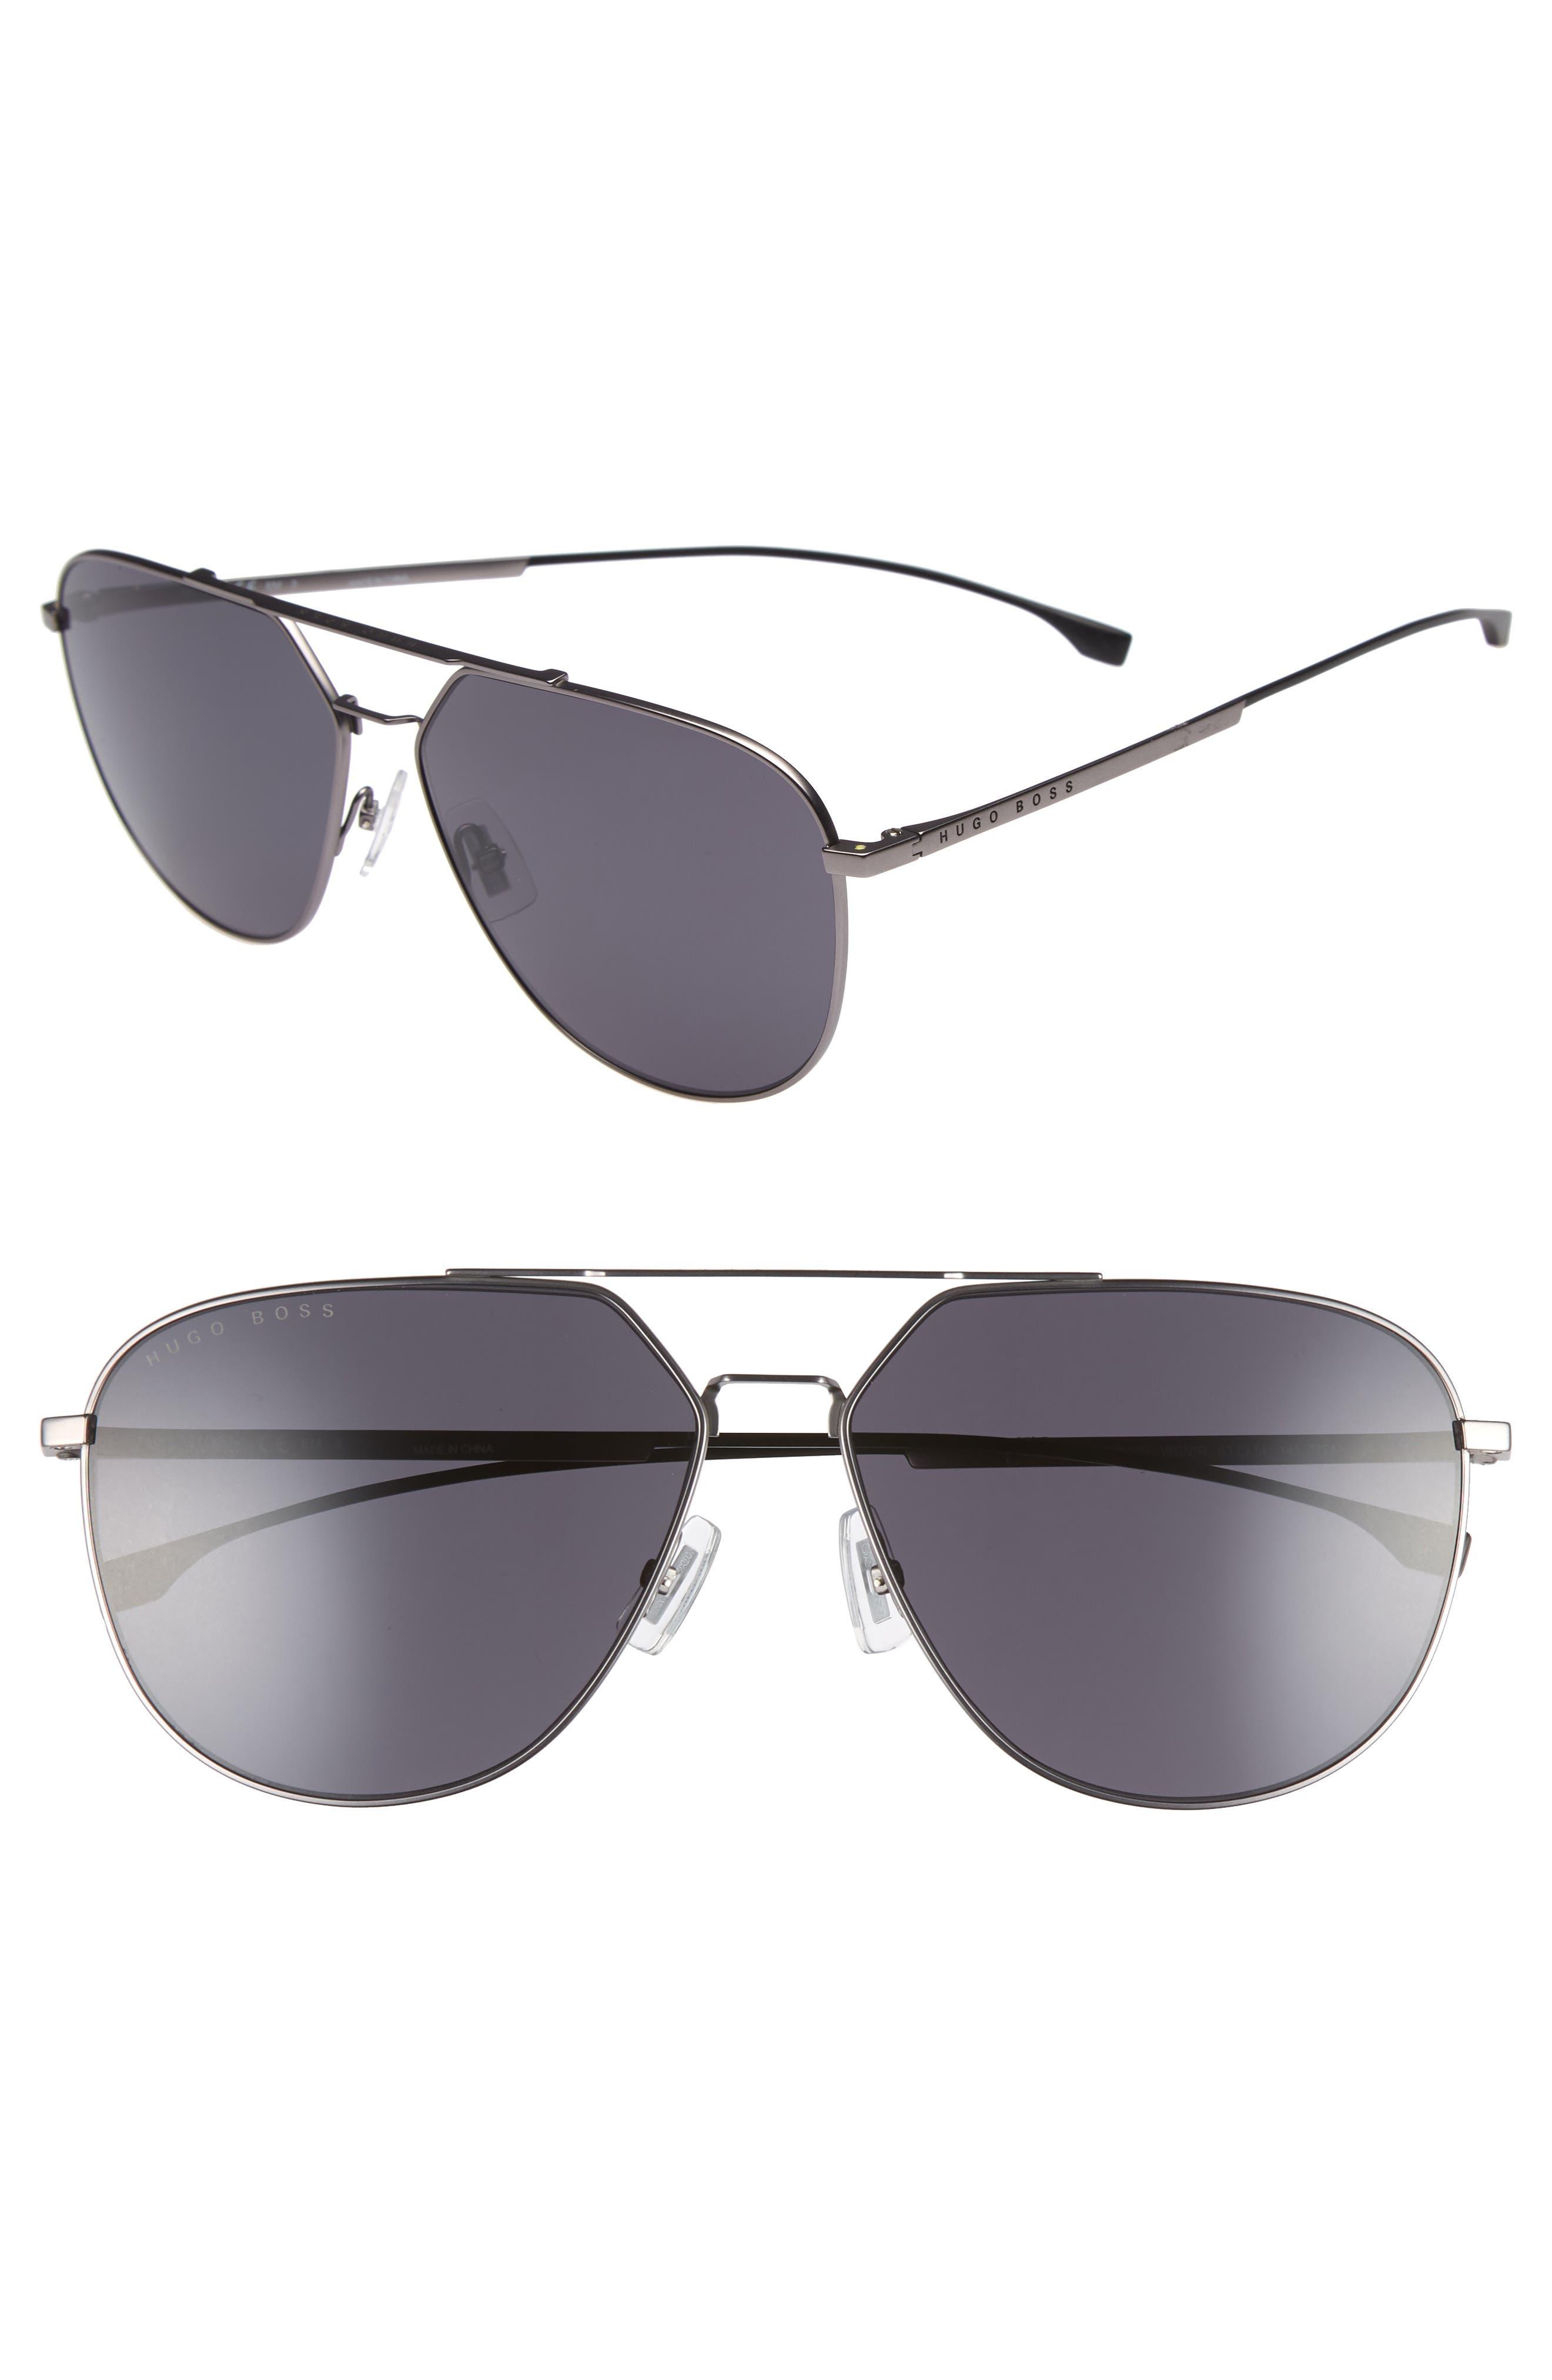 63mm Polarized Aviator Sunglasses,                         Main,                         color, Matte Grey